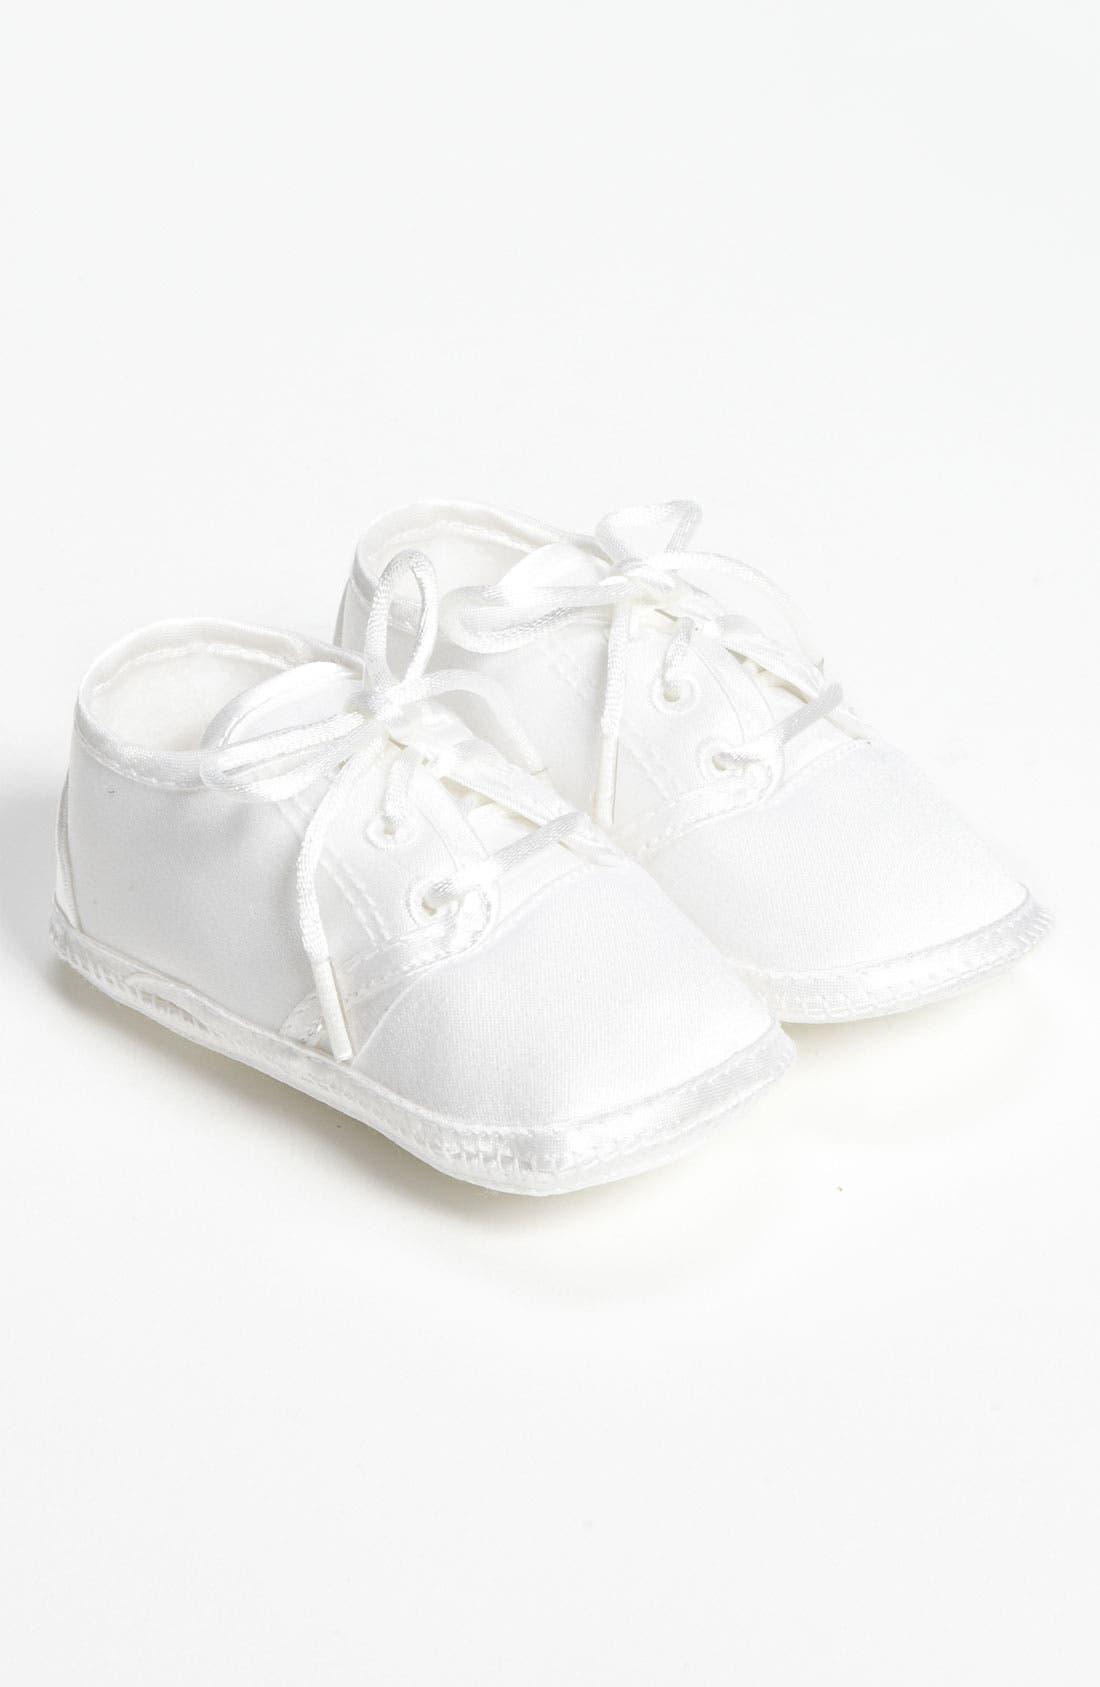 Matte Satin Shoe,                         Main,                         color, WHITE